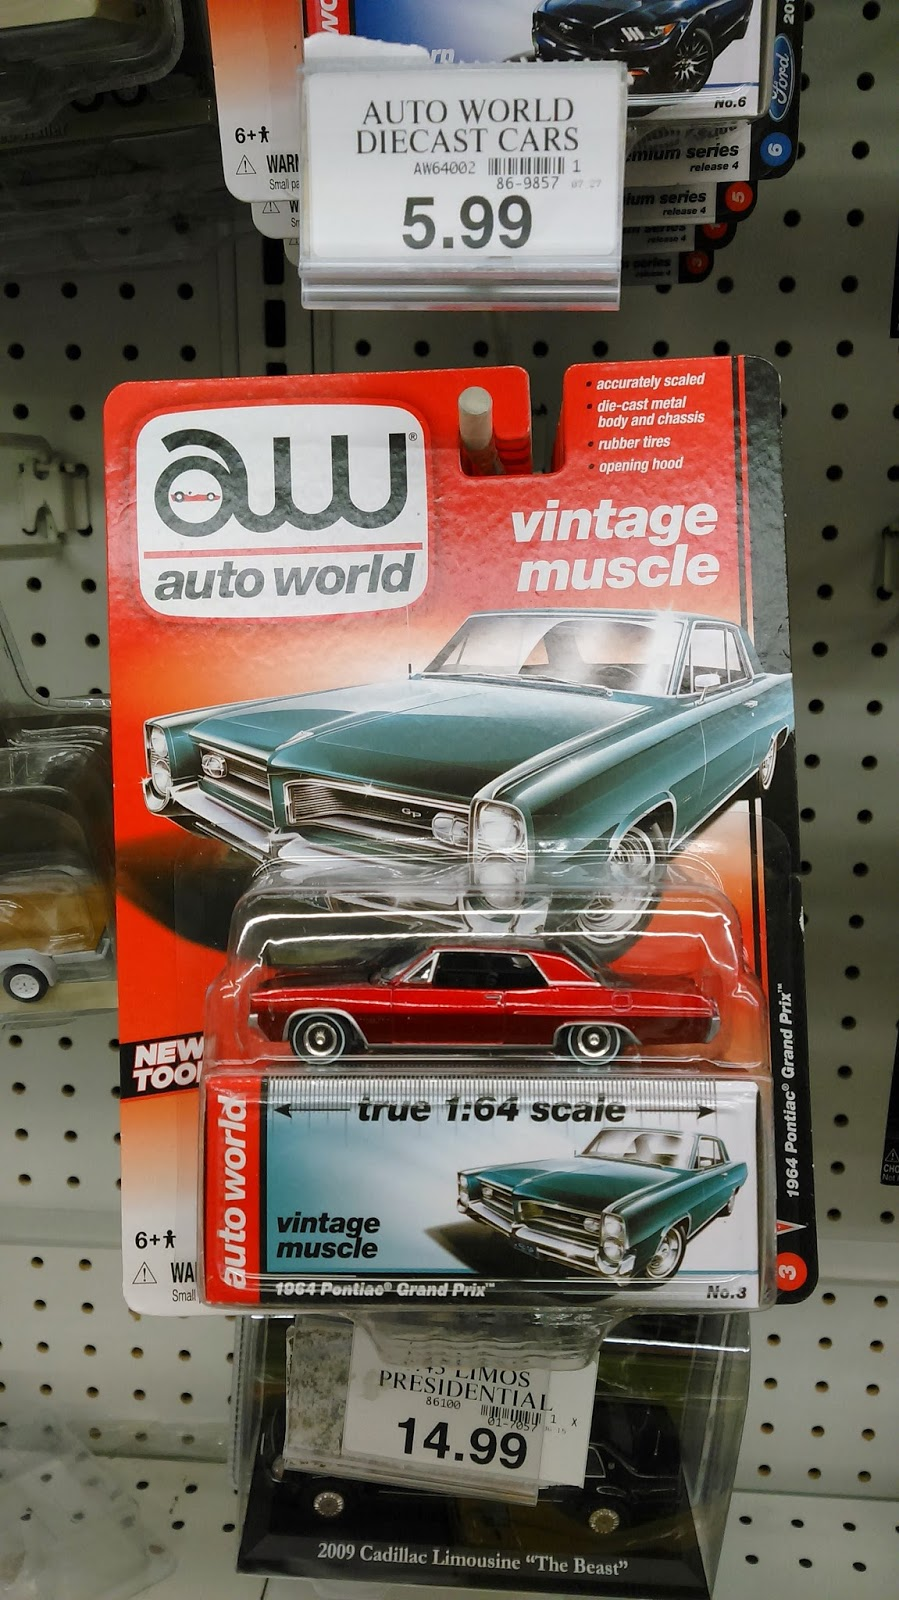 Auto World Vintage Muscle - 1964 Pontiac Grand Prix CHASE!